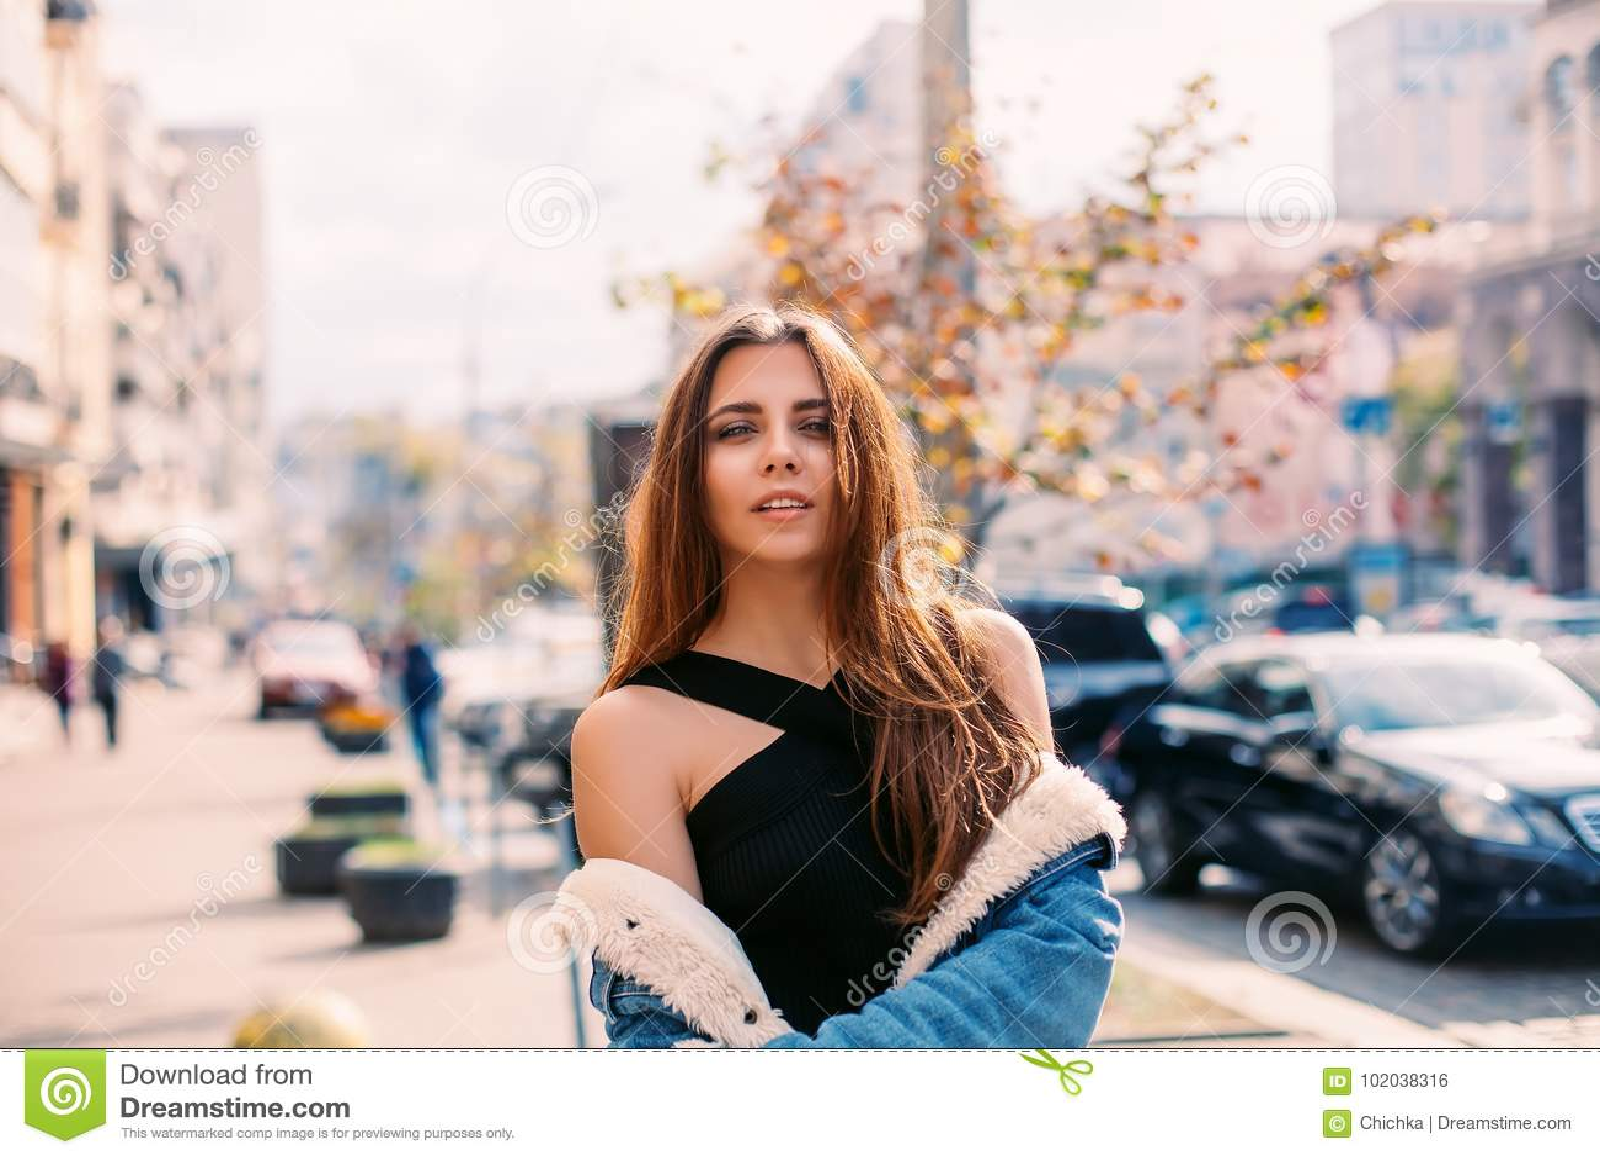 Fashion Hipster Woman Posing Outdoor Denim Jacket Red Hair